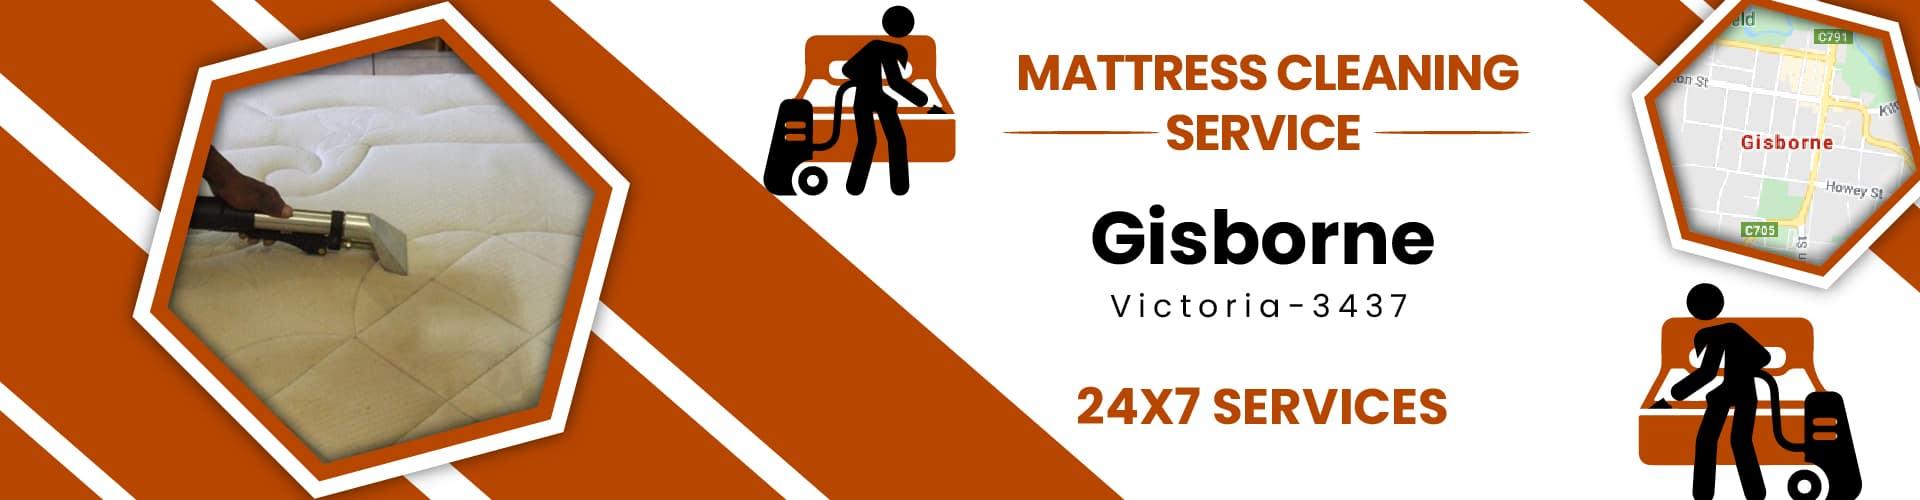 Mattress Cleaning Gisborne